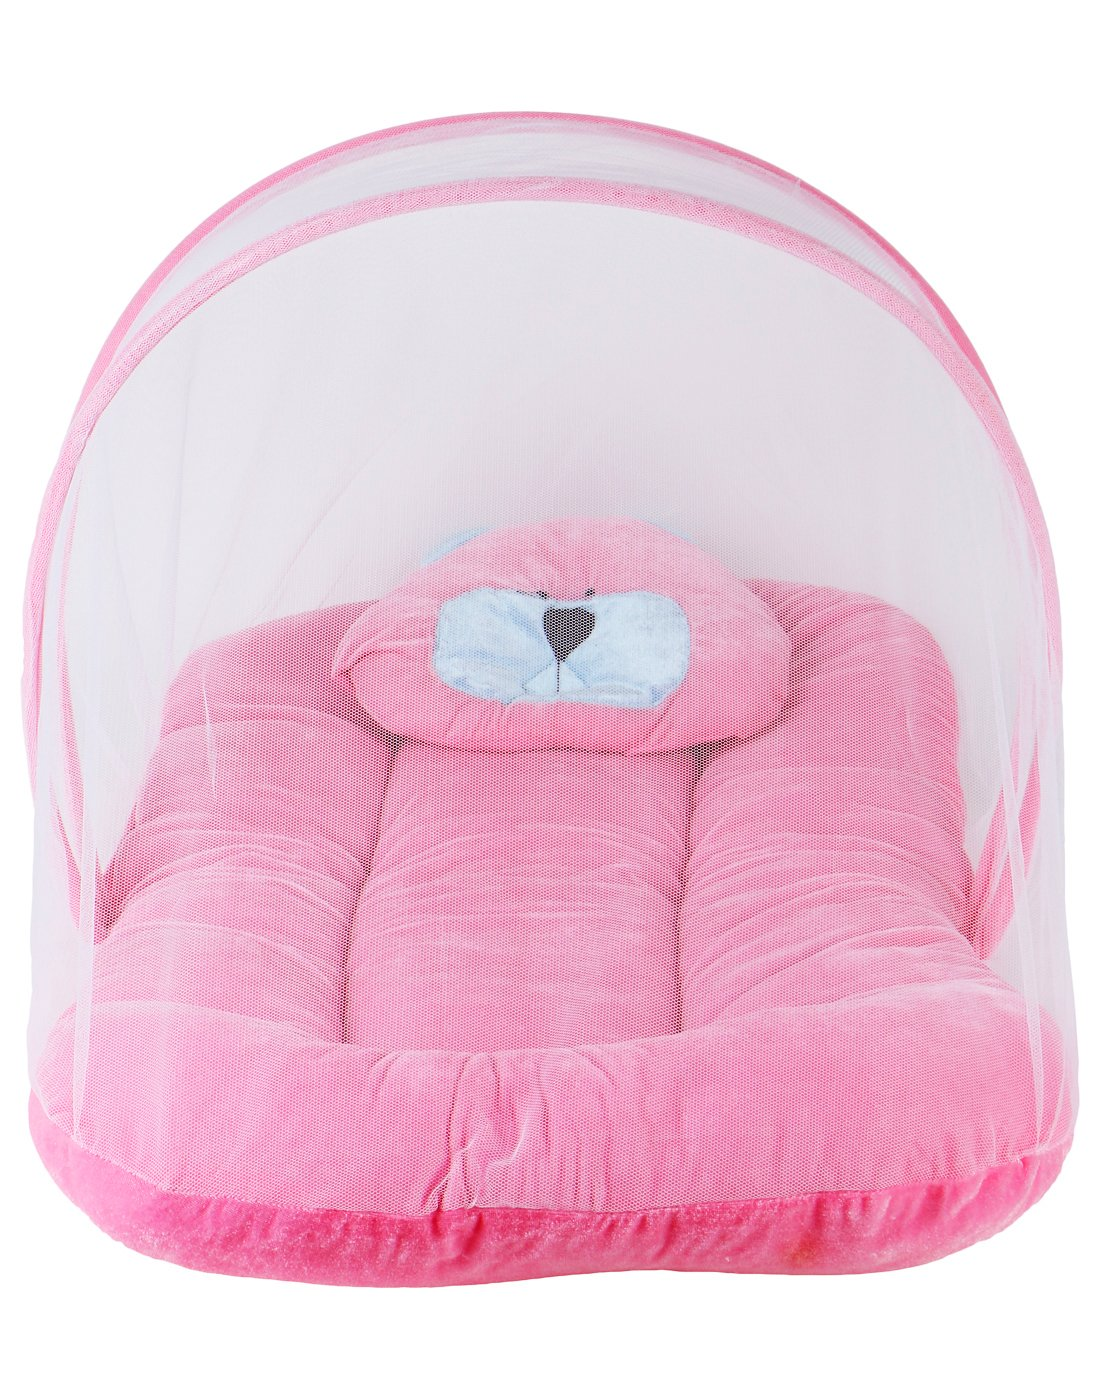 Littly Contemporary Velvet Baby Bedding Set, 0-6 Months, Pink